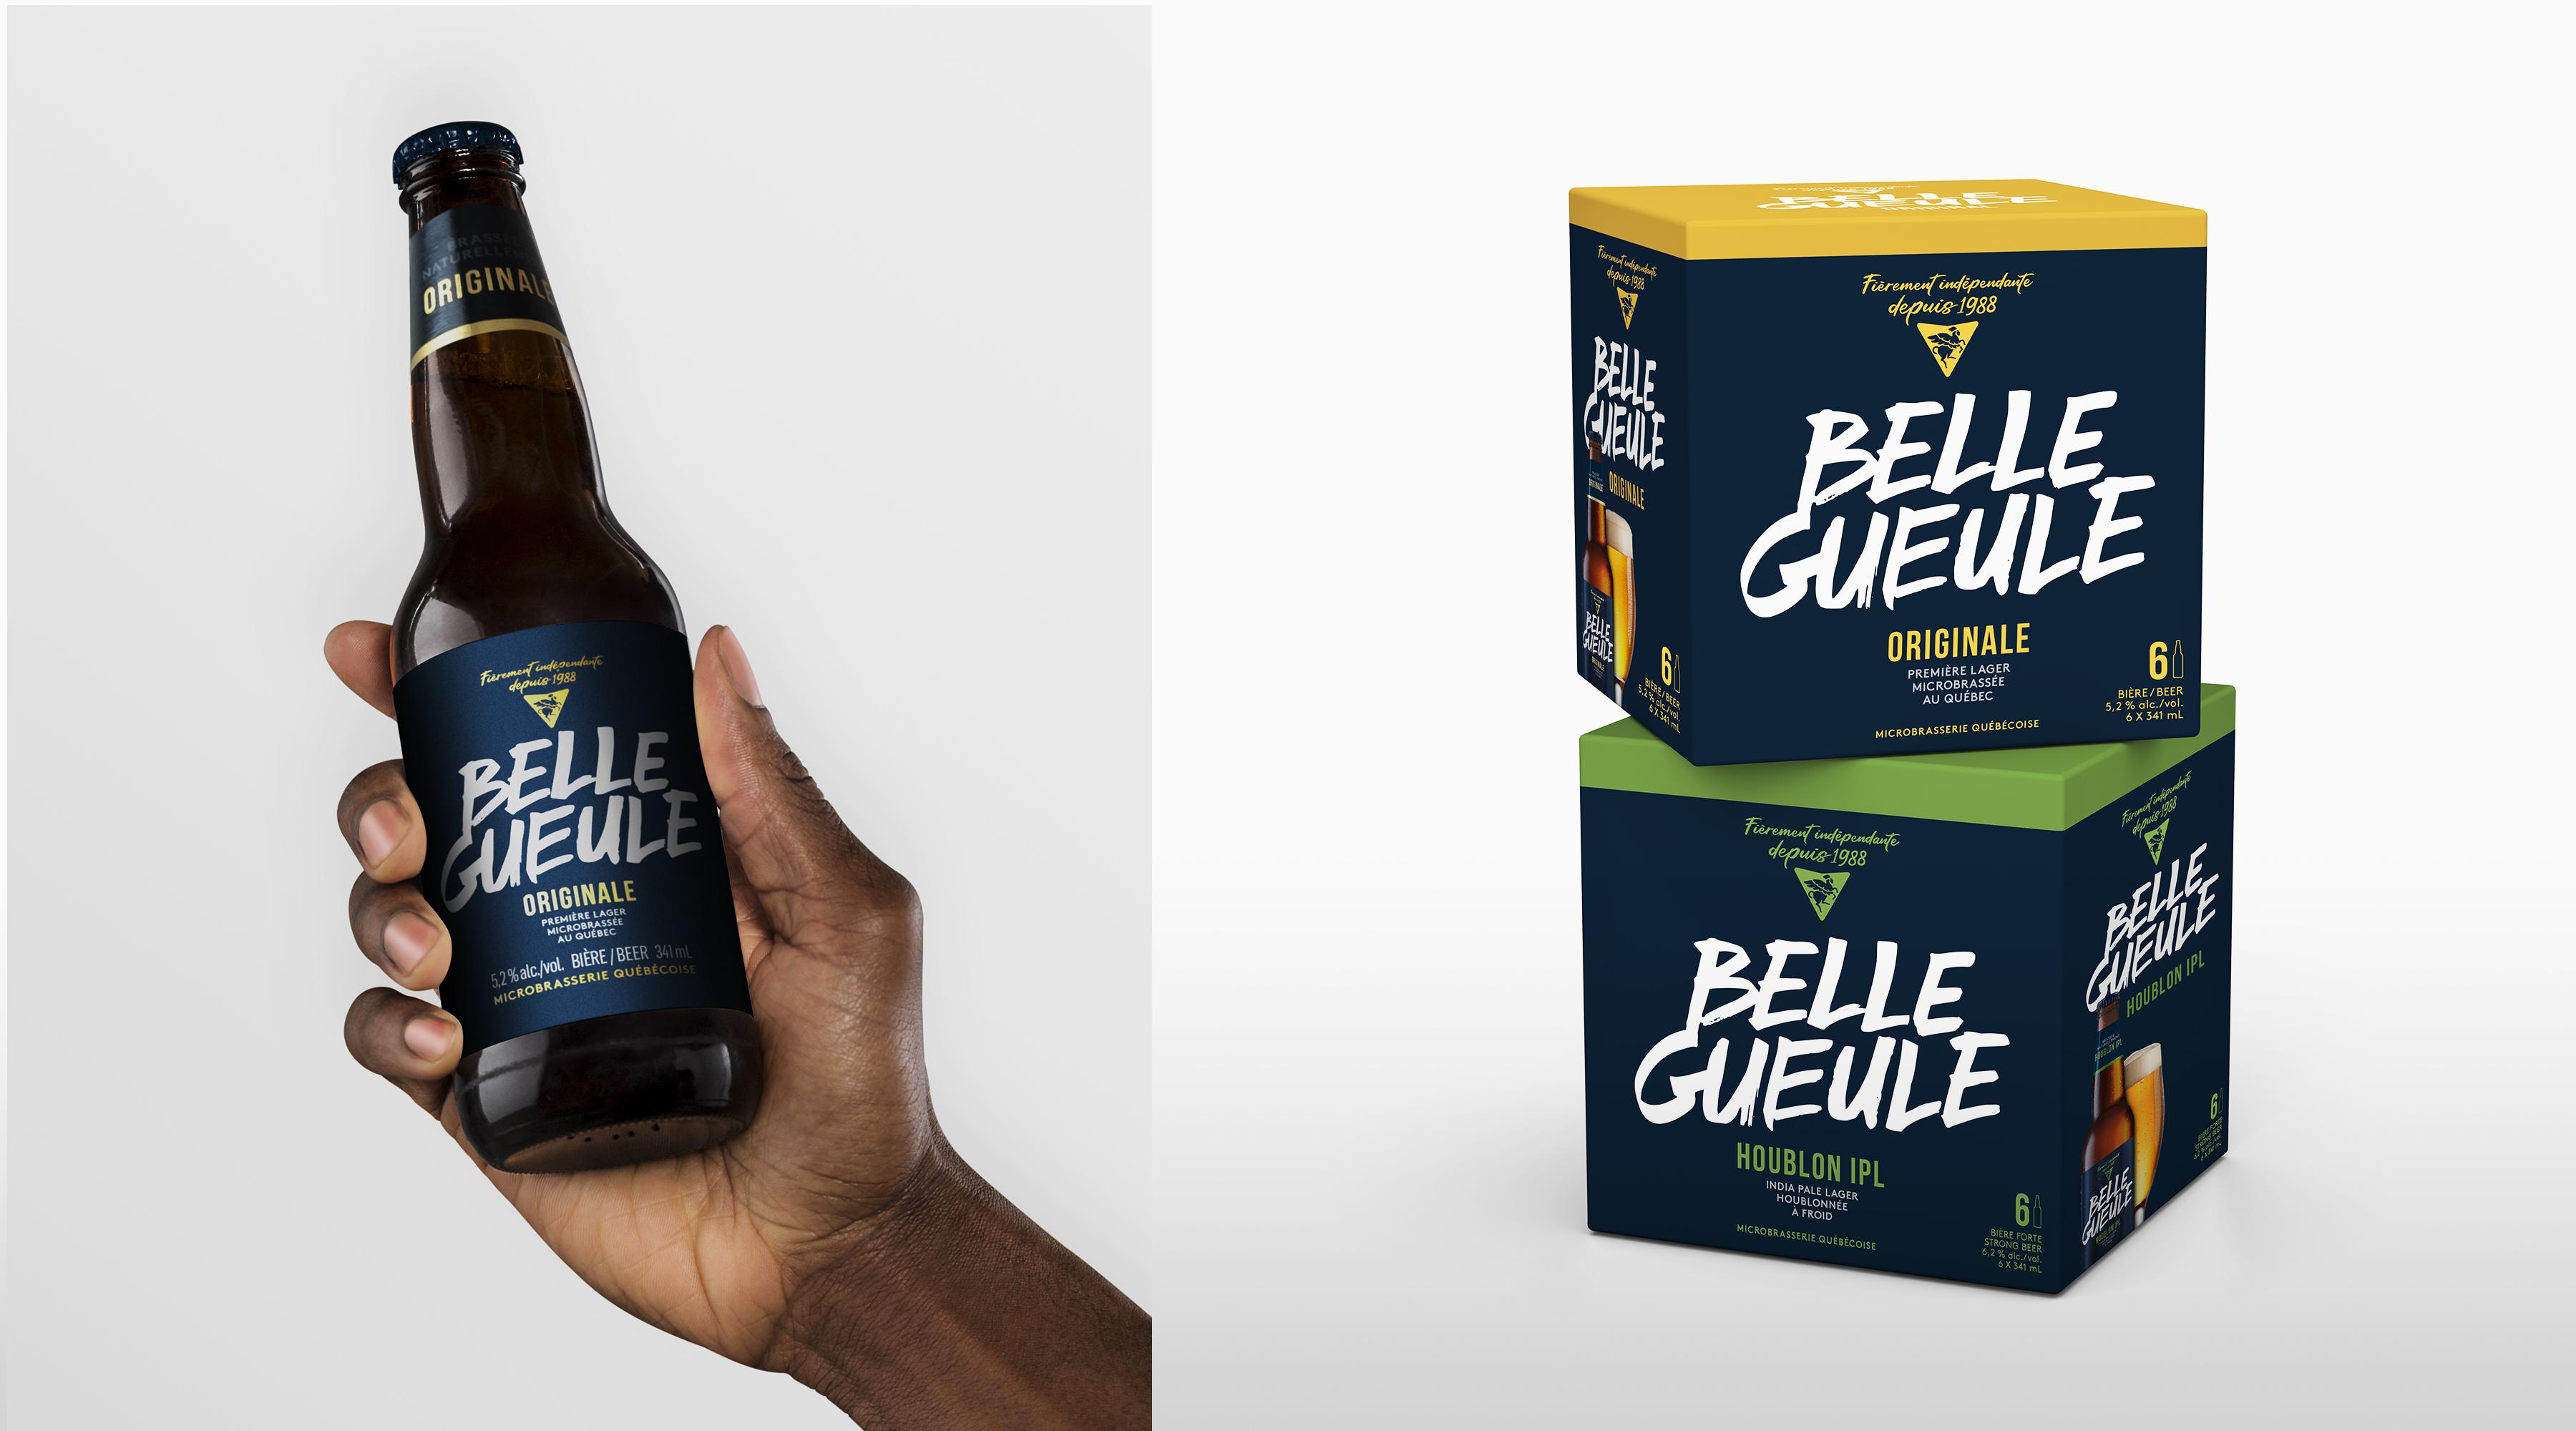 Belle Gueule 2